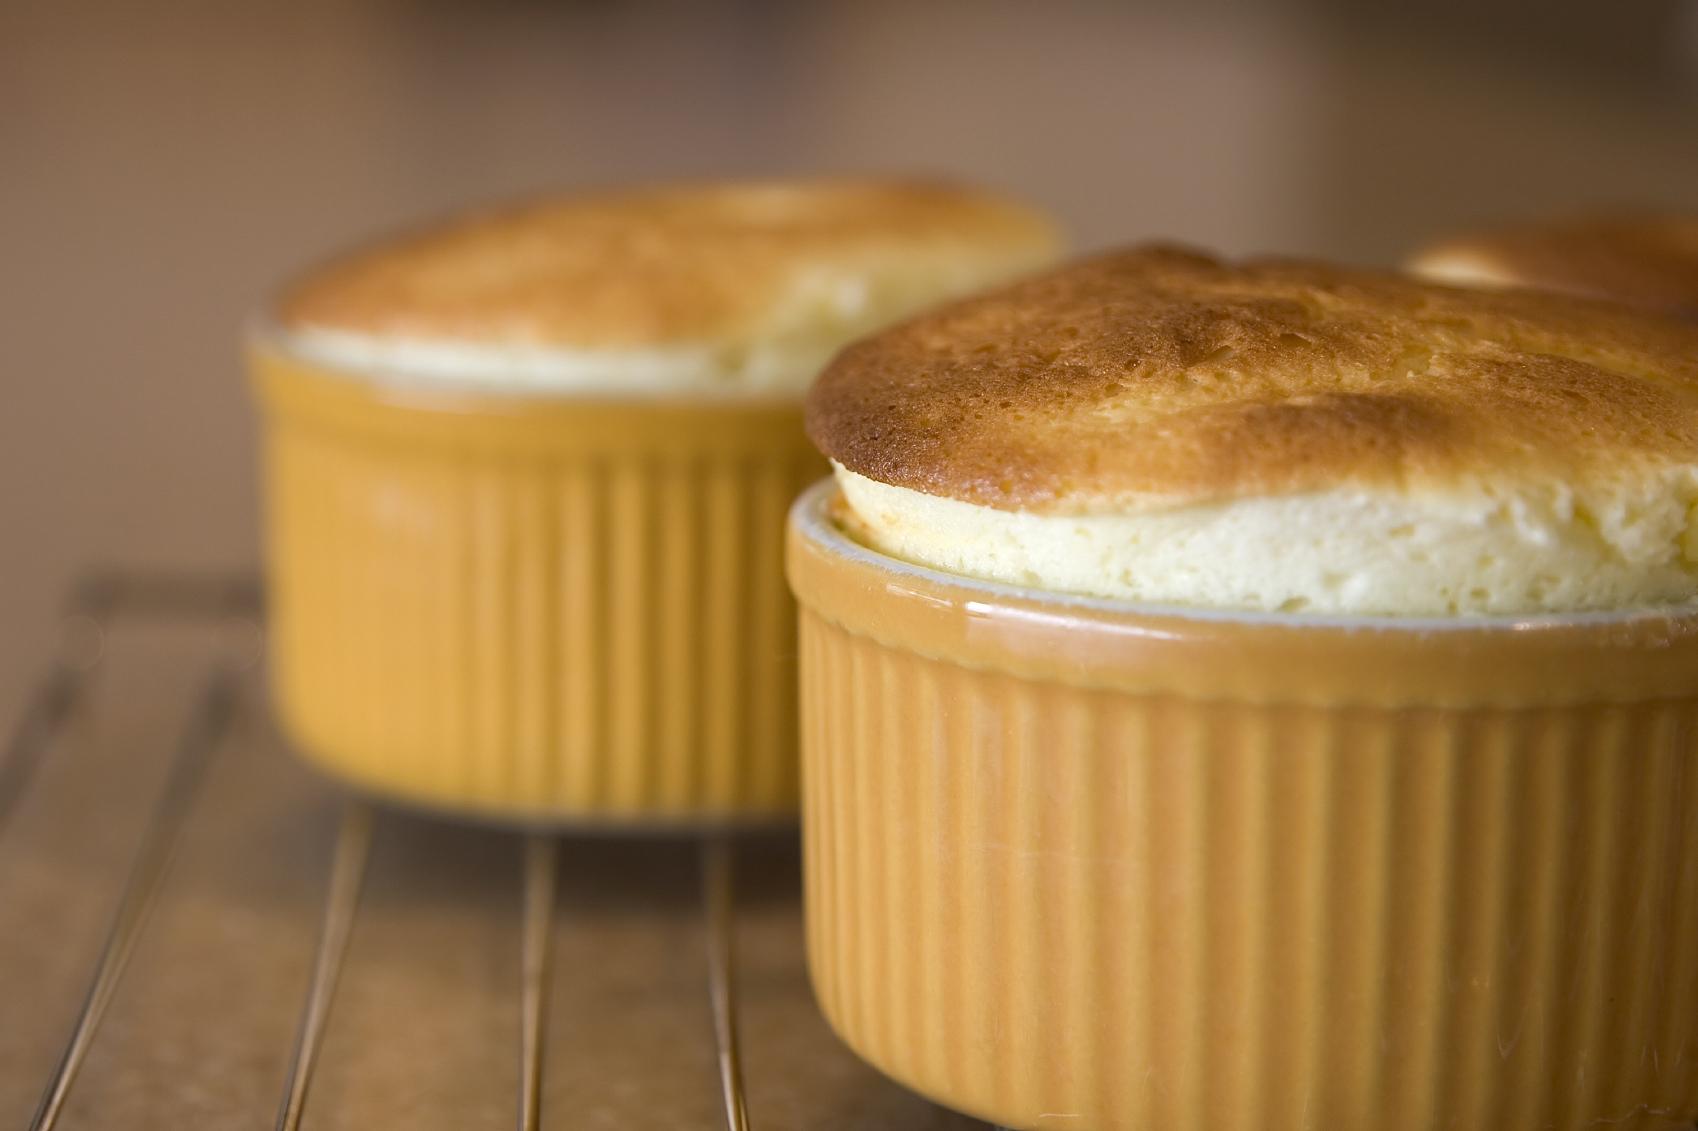 Mandarine souffles: Suflè tal-mandolin